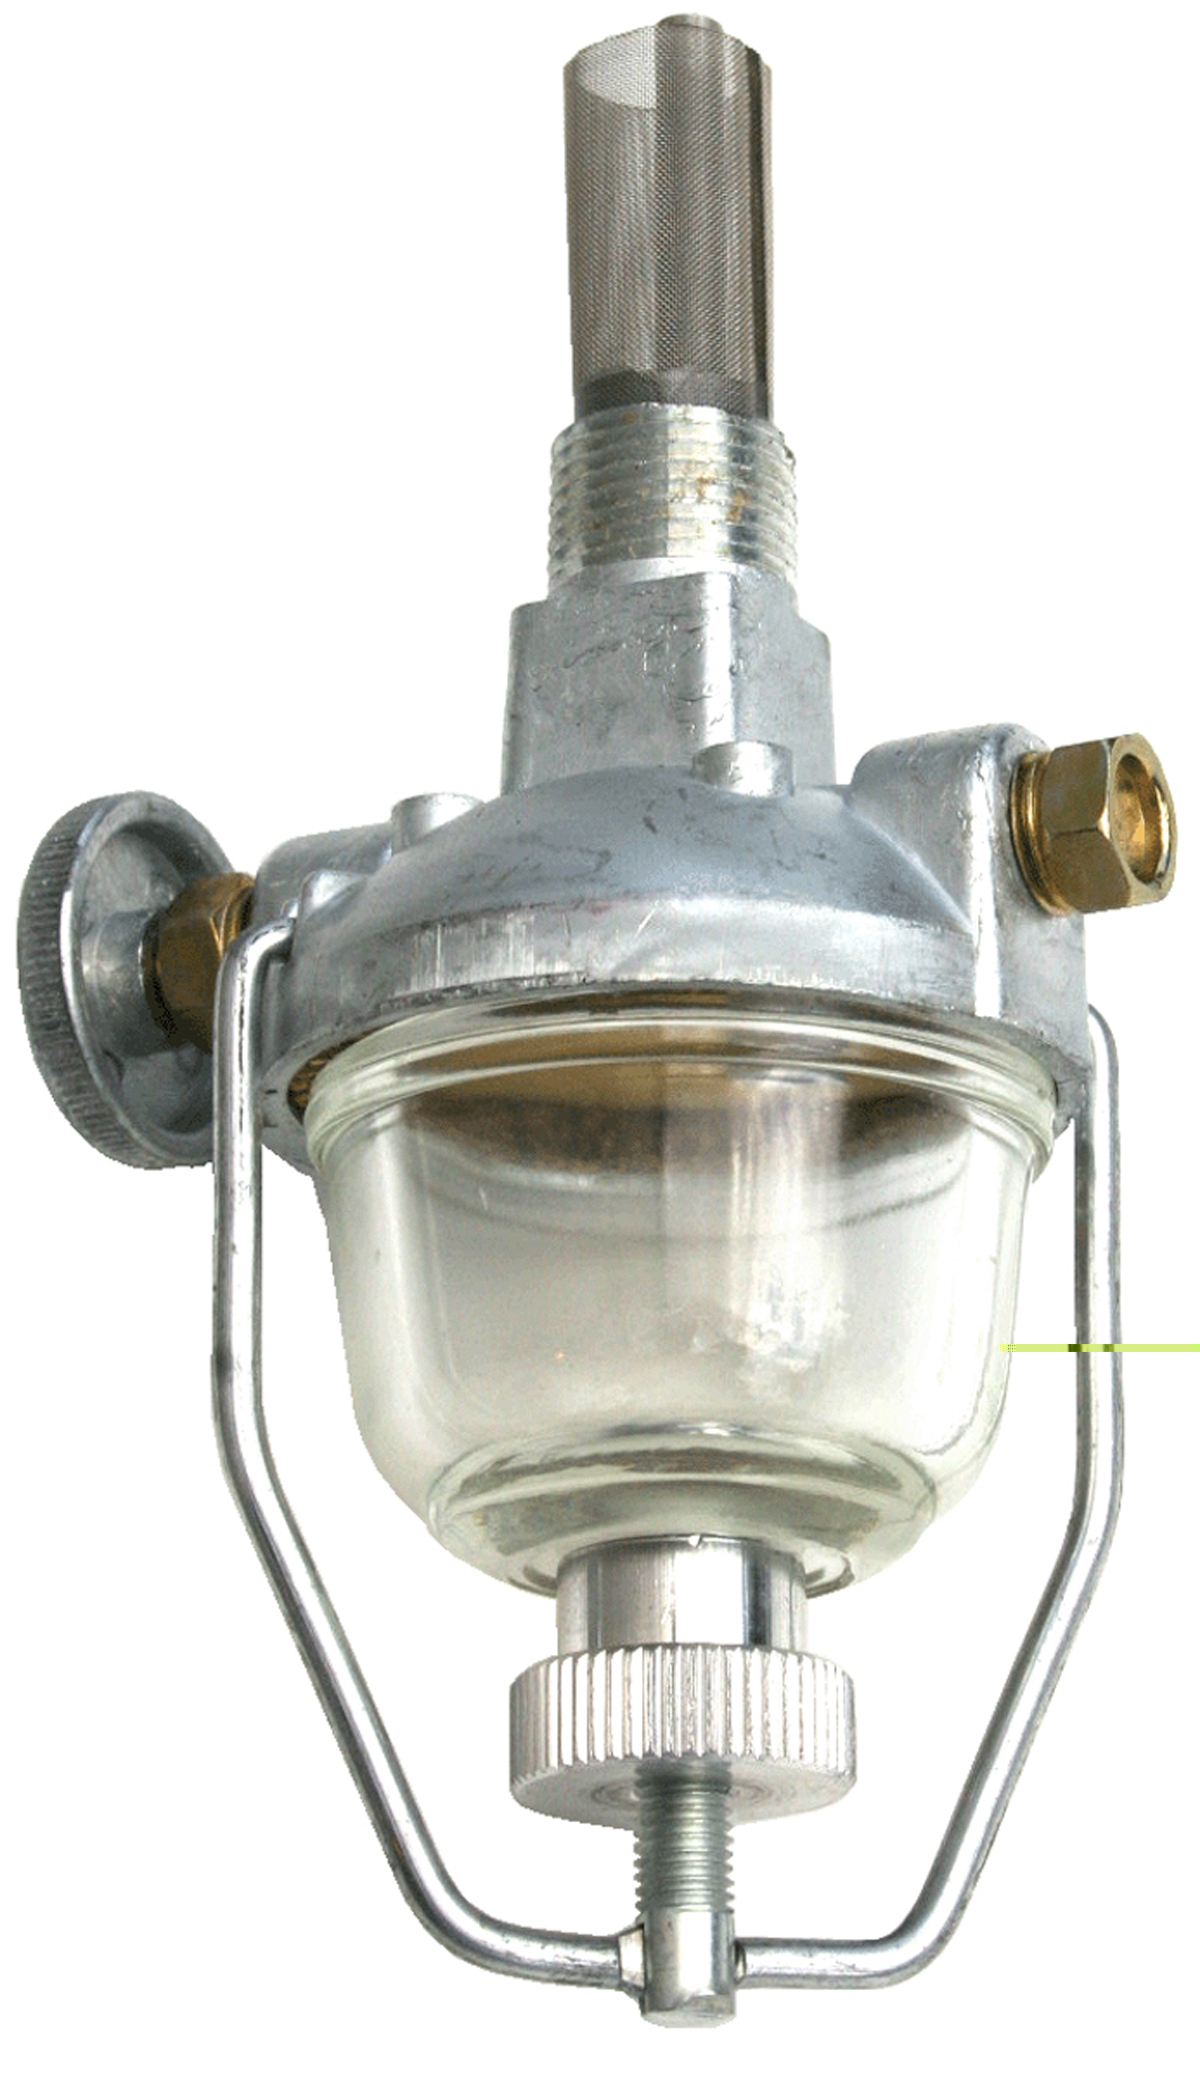 1103-3397 - ford 9n 2n 8n fuel strainer (sediment bowl ... 8n ford fuel filter #15